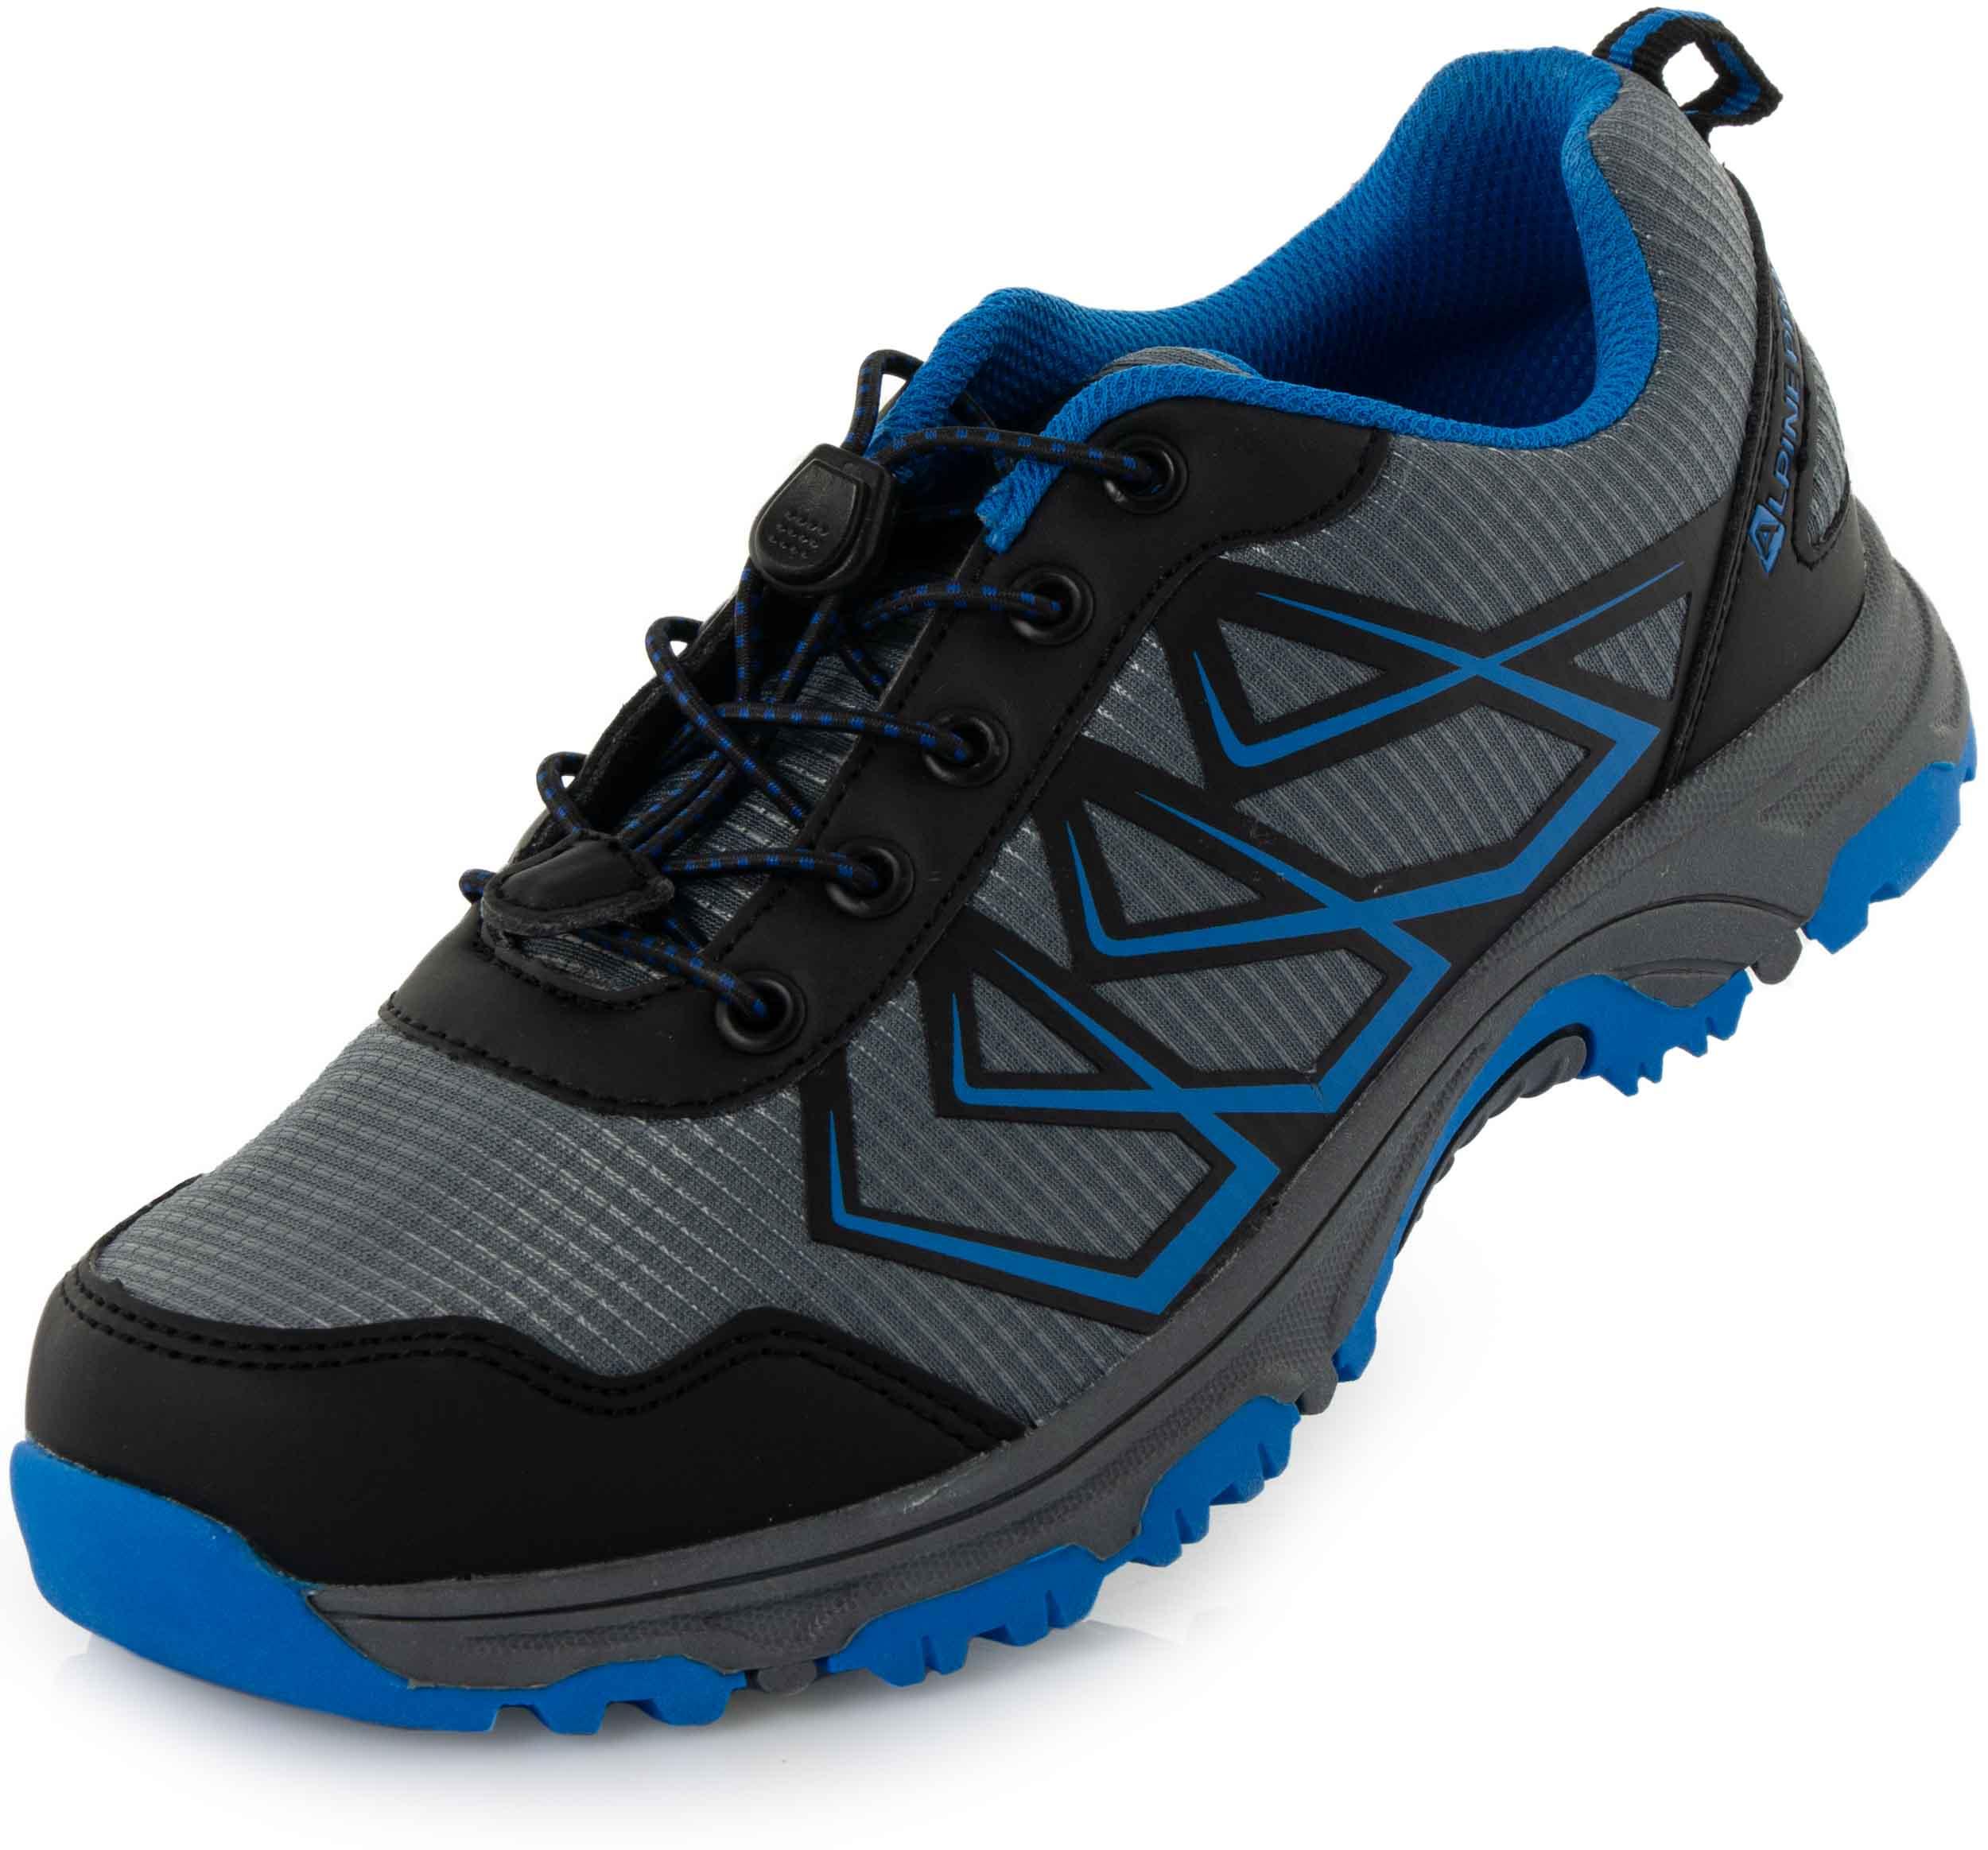 Sportovní obuv Alpine Pro Repto